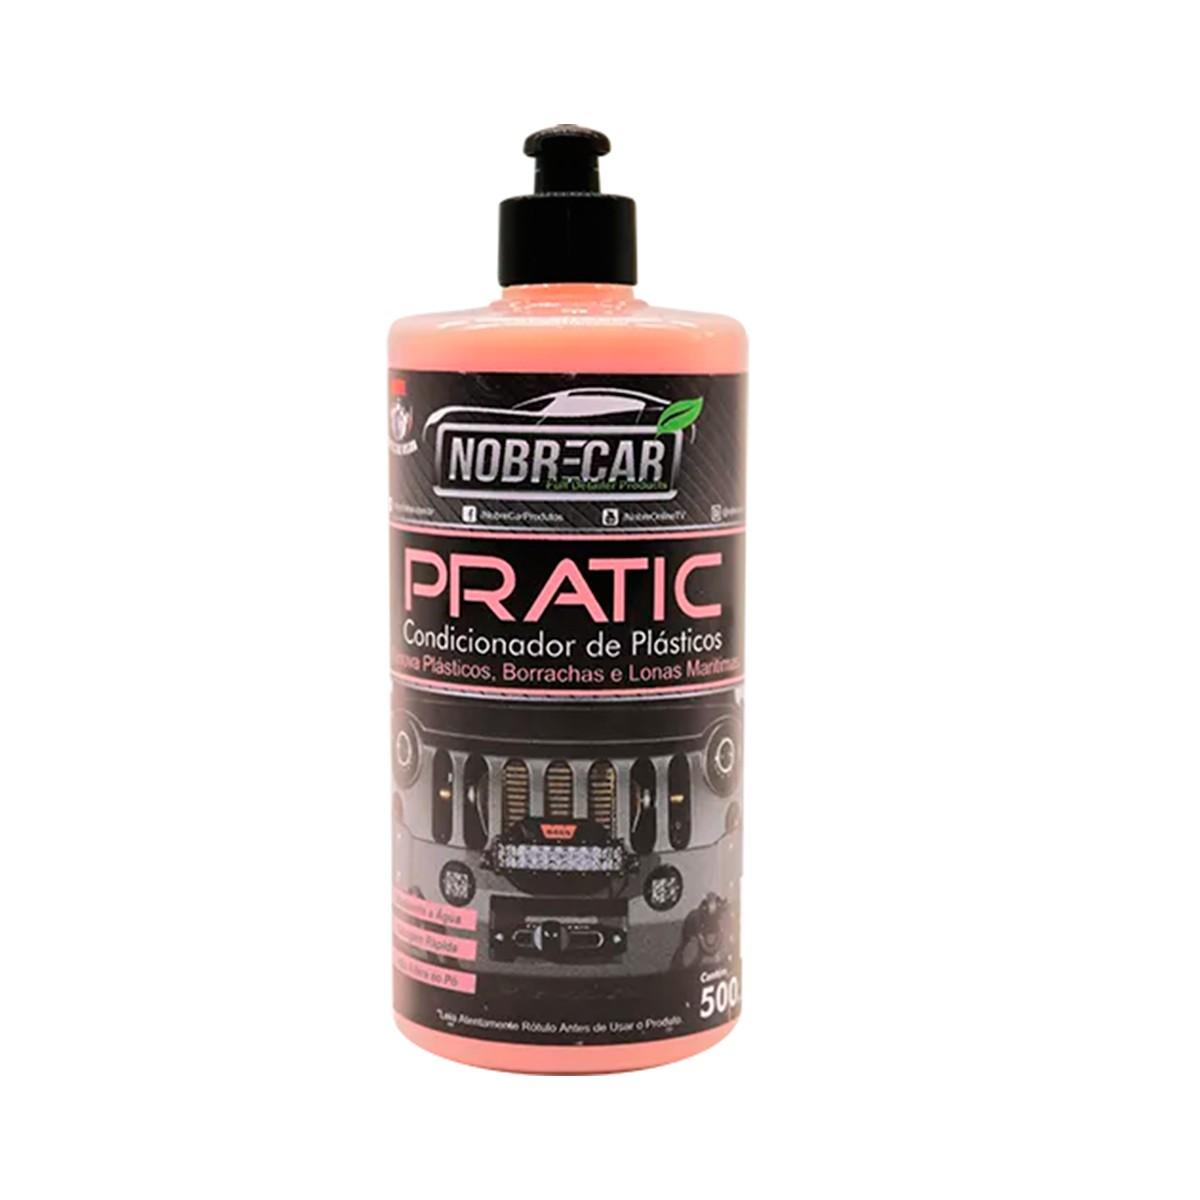 Pratic ( Condicionador de Plásticos Pratic)  500mL - Nobrecar